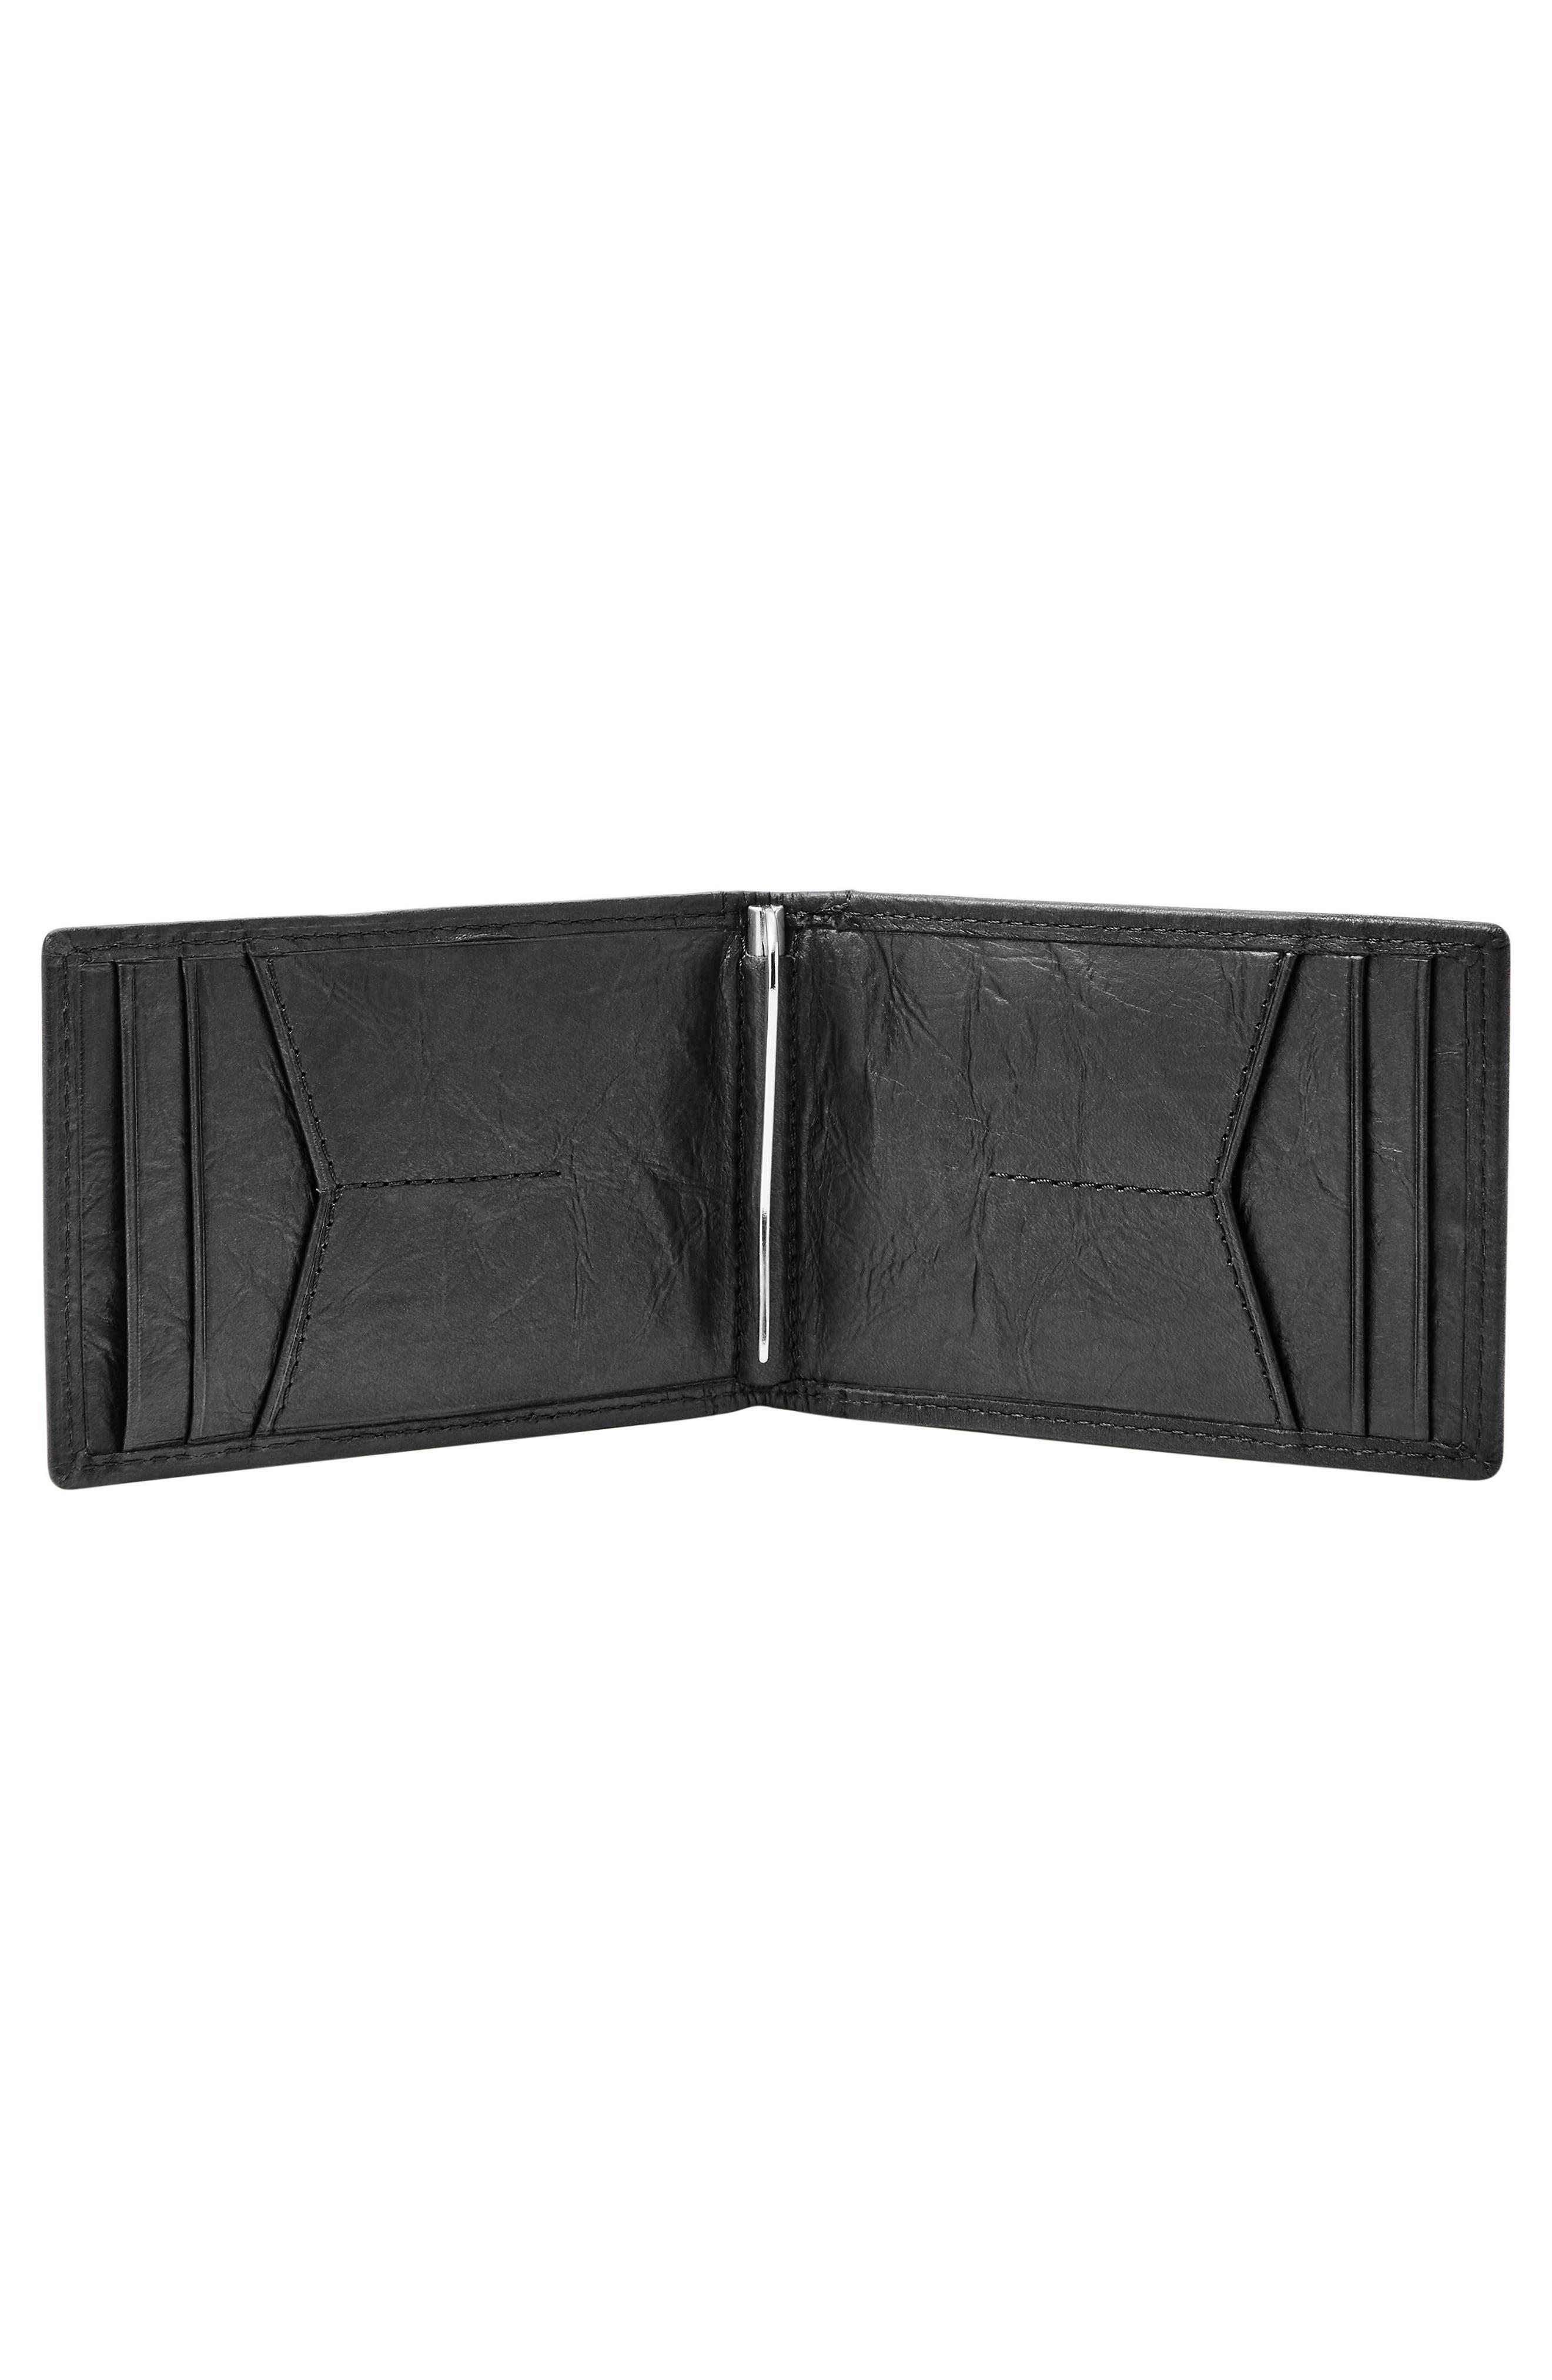 Alternate Image 2  - Fossil Neel Leather Money Clip Wallet